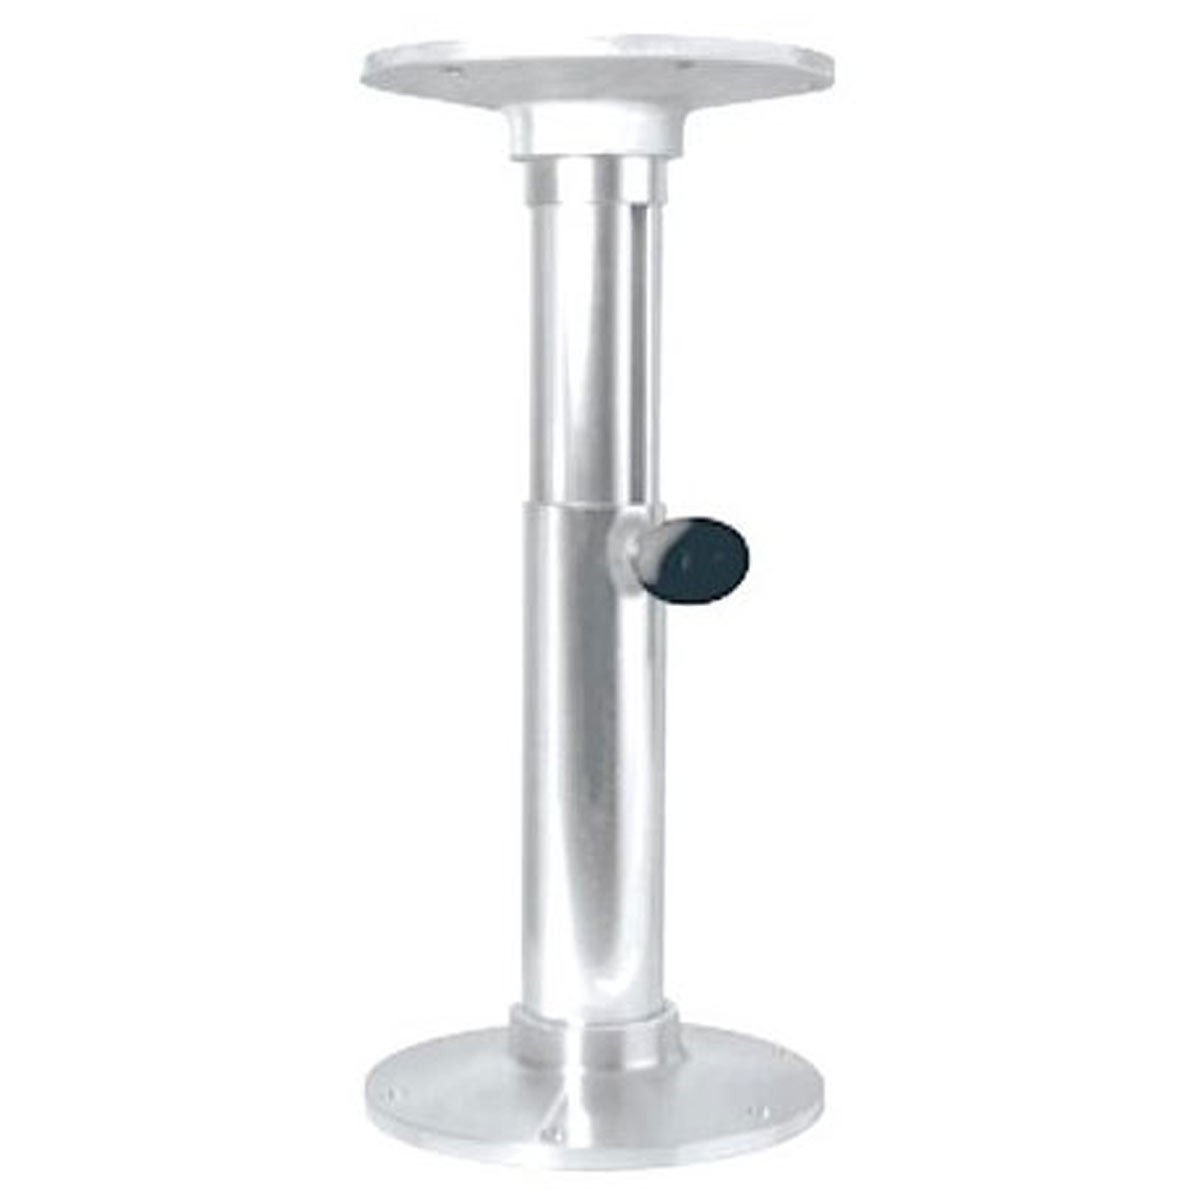 Garelick/EEZ-in 7525:1 Manual Adjustable Table Base Polished ...